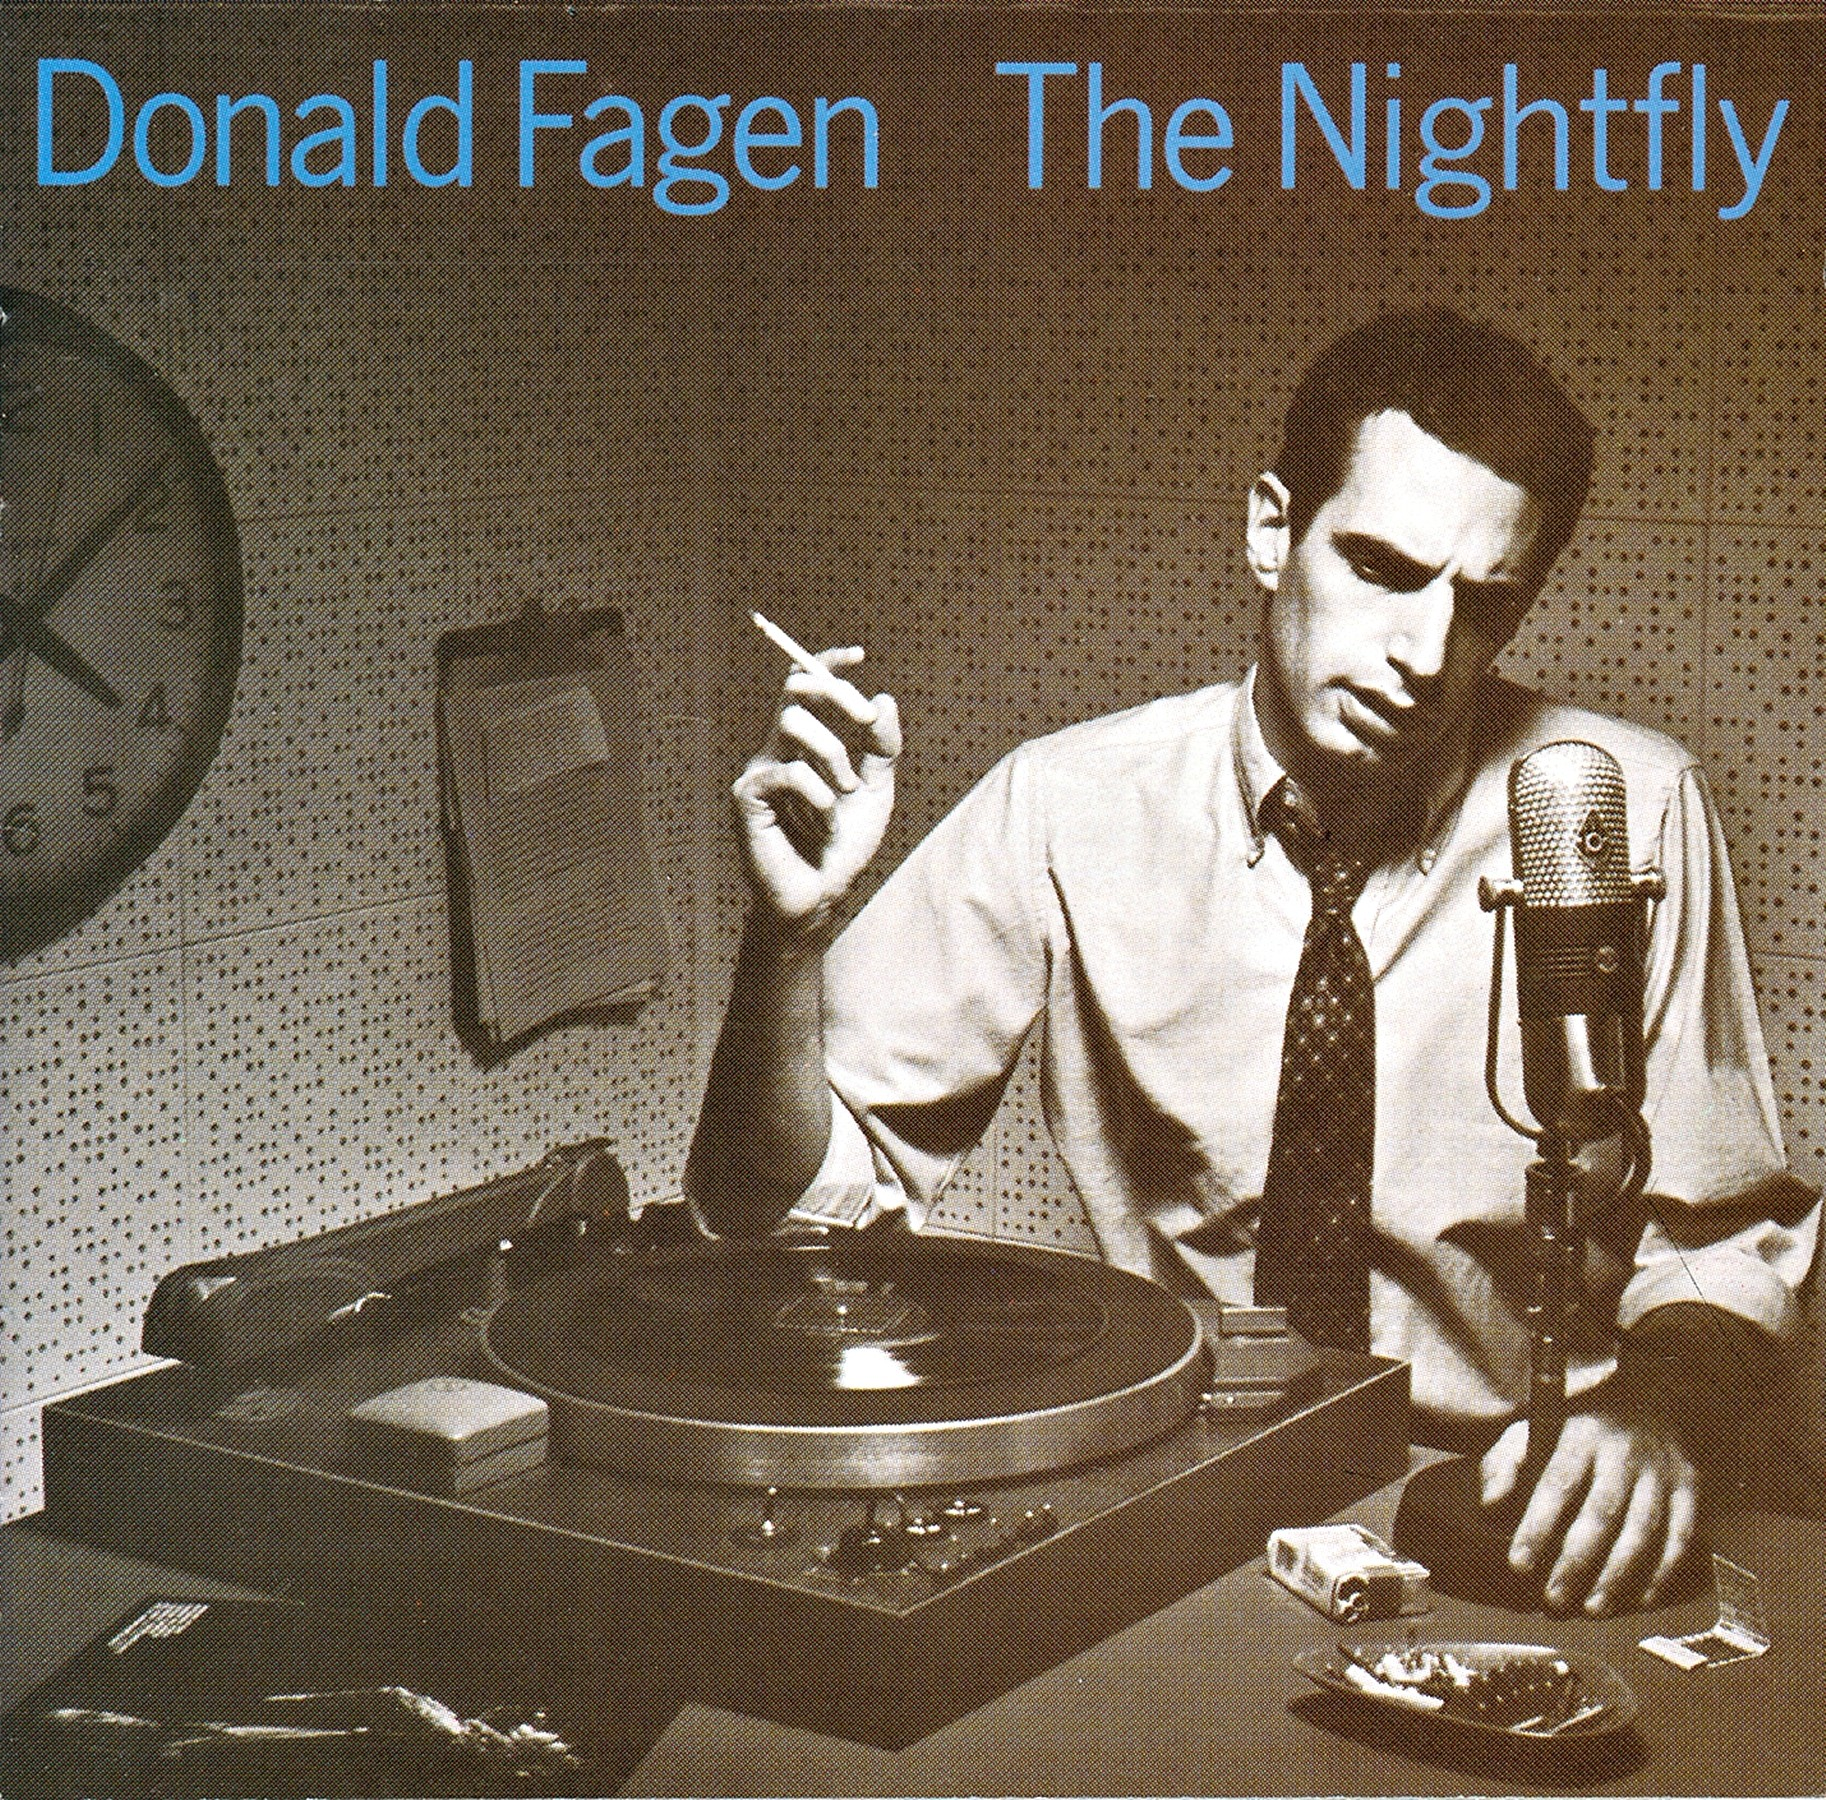 Donald Fagen - Maxine